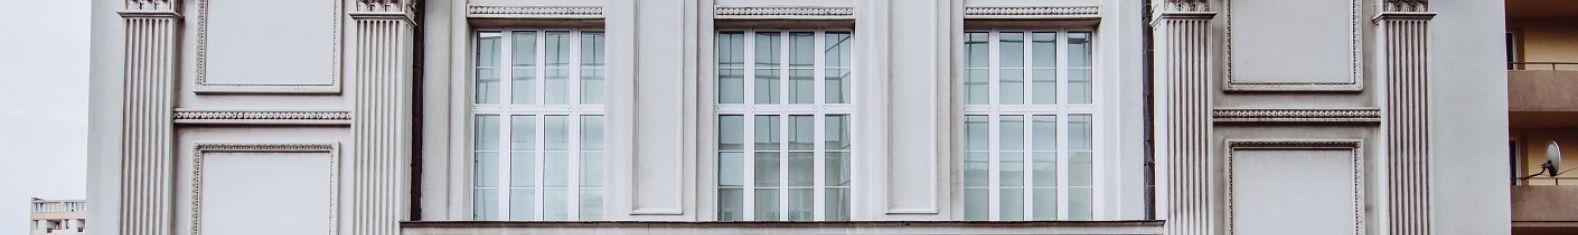 budynek_front.jpg